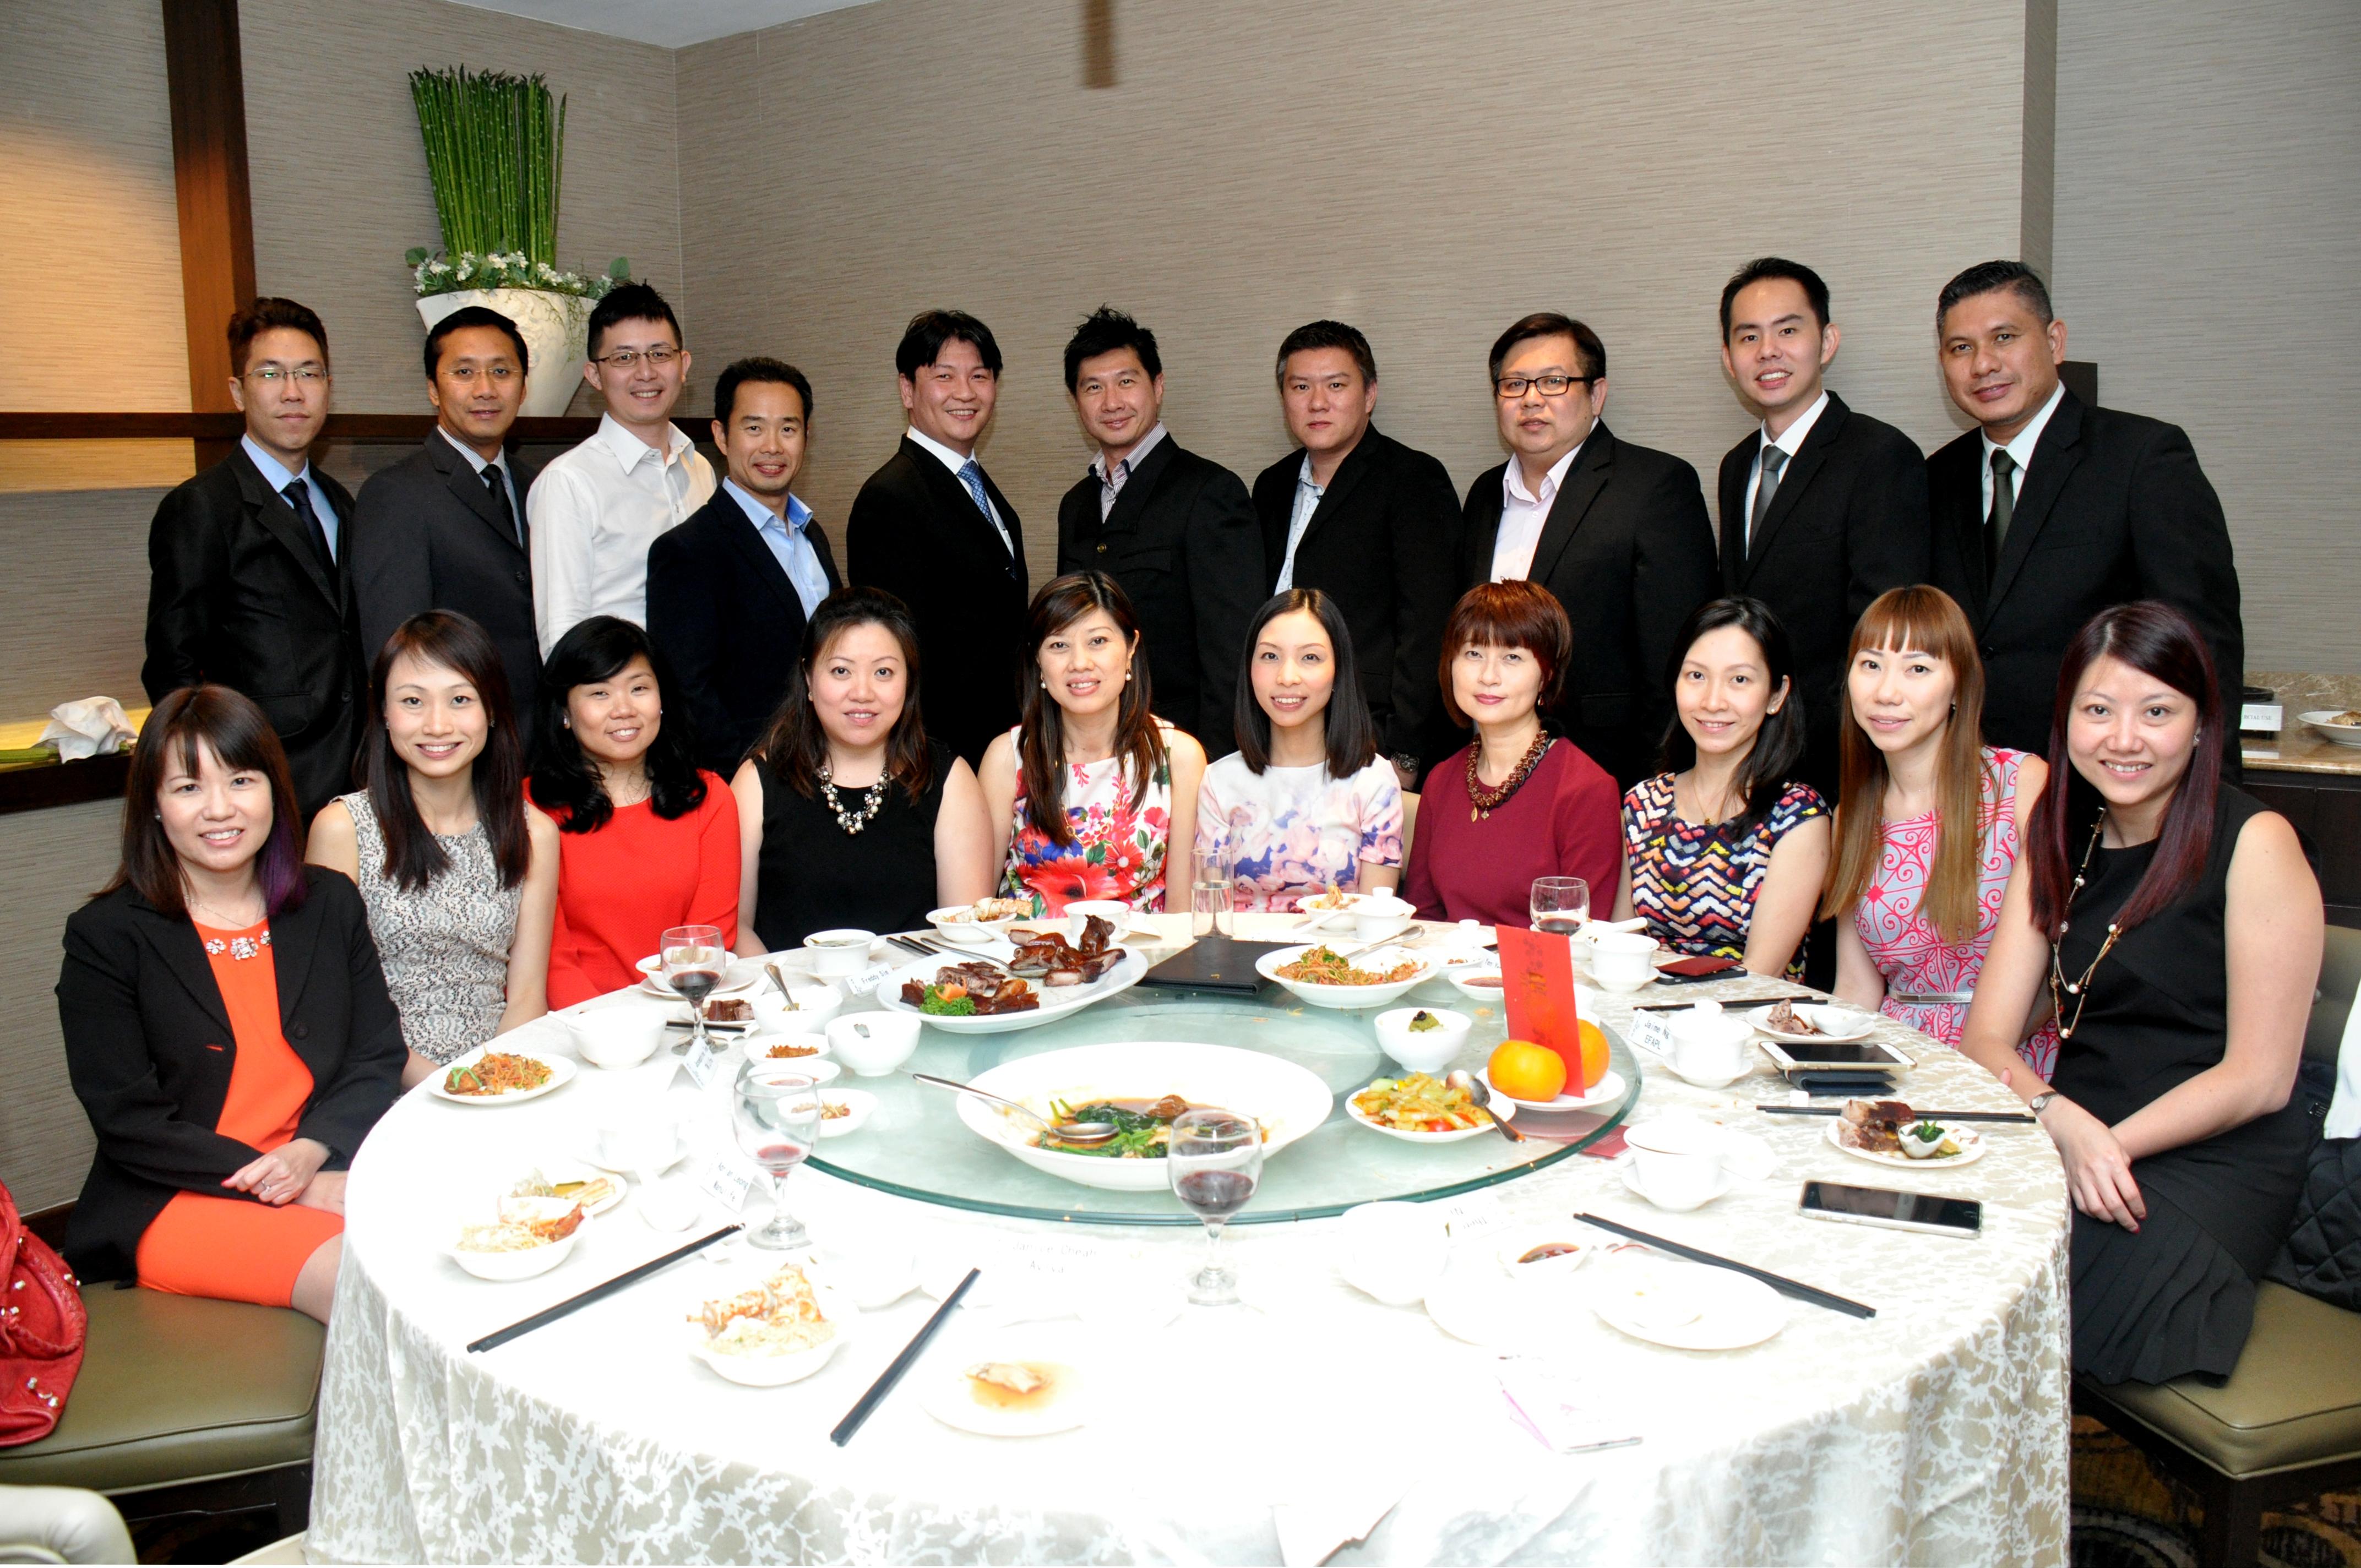 Weddings At Si Chuan Dou Hua At Parkroyal Beach Road: Eternal Financial Advisory